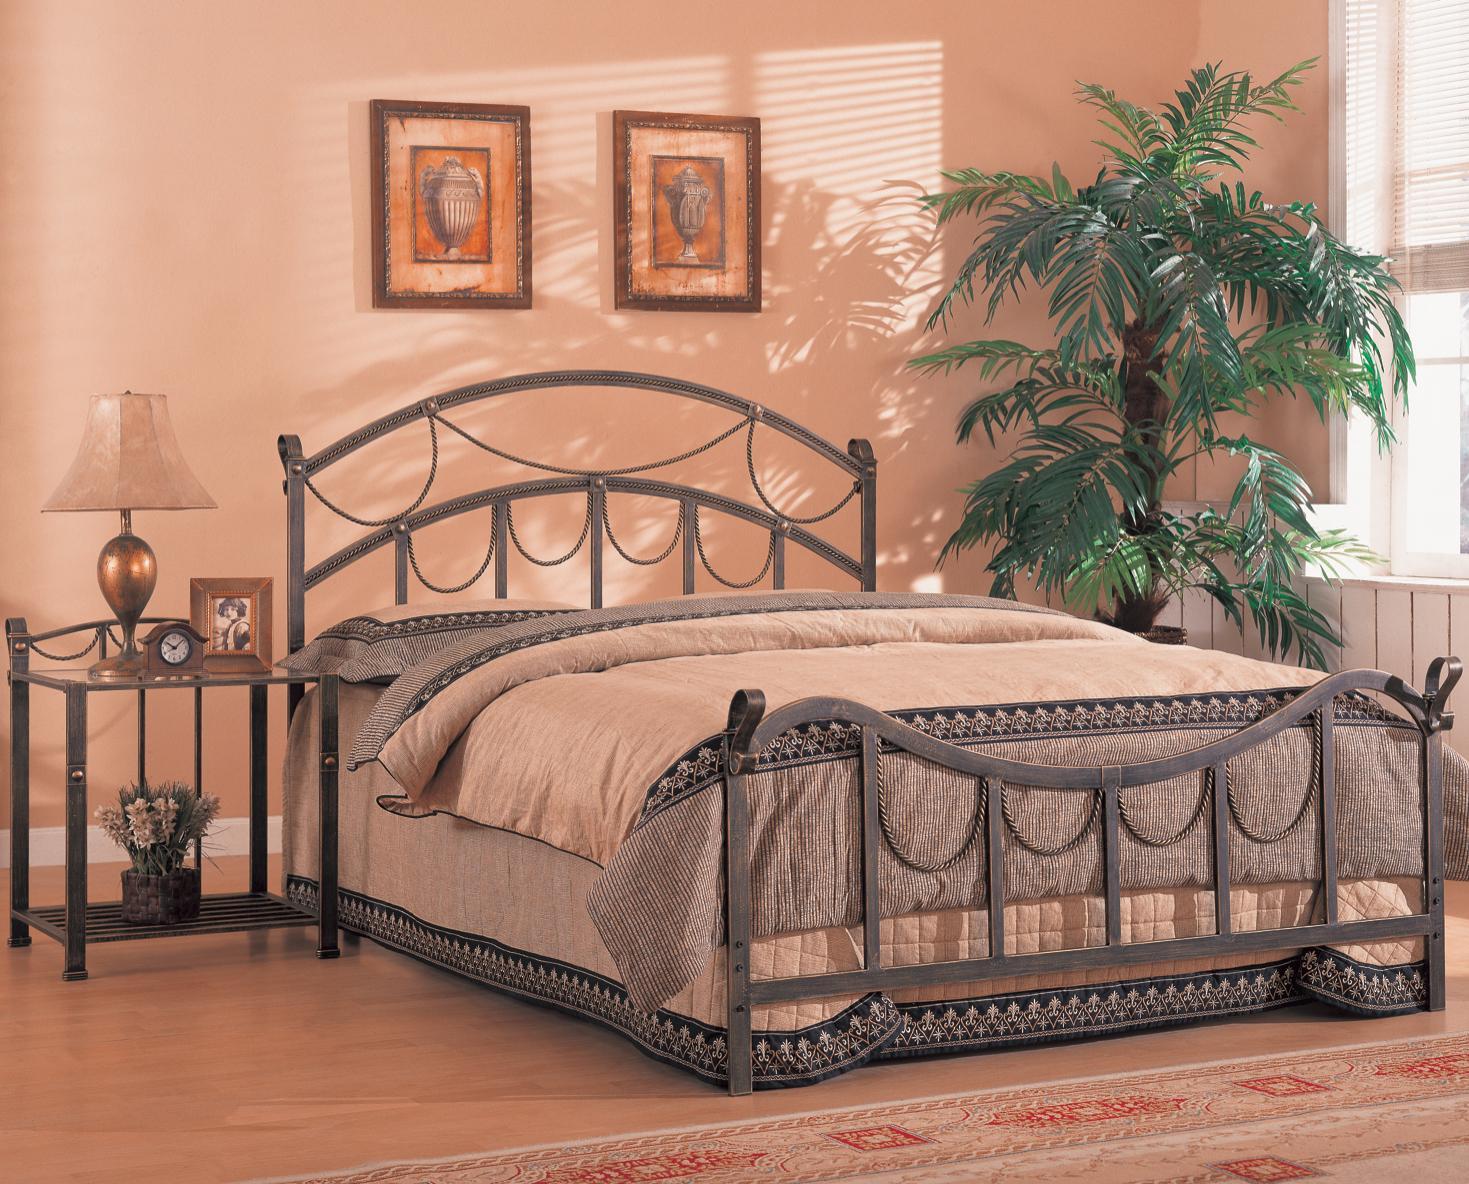 Bedroom Sets Georgia coaster georgia queen bedroom group - del sol furniture - bedroom